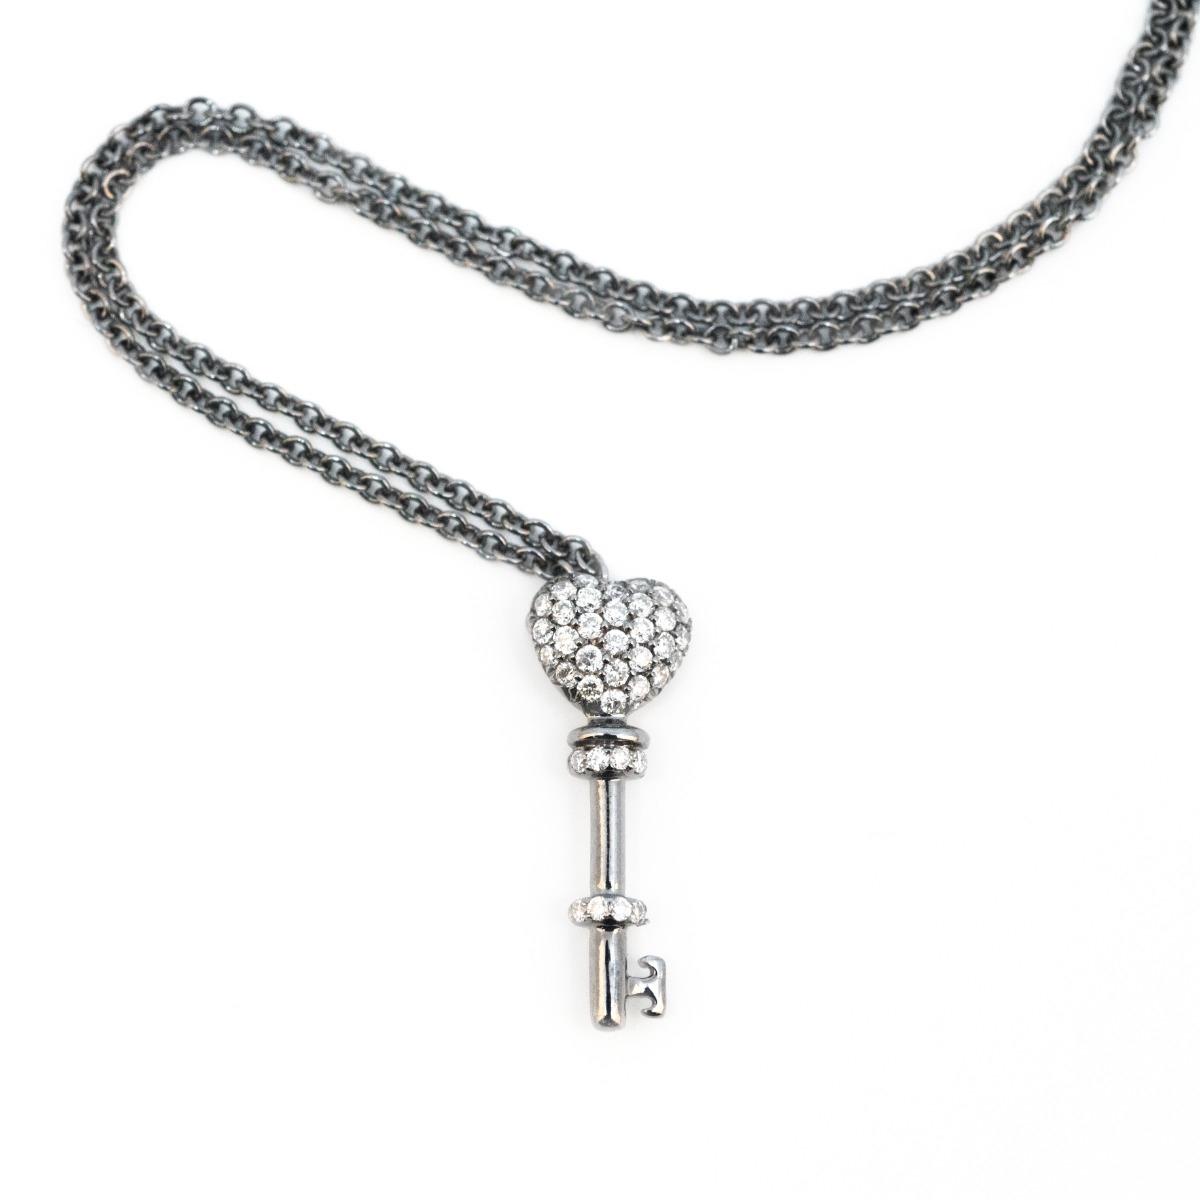 Diamond Key Pendant Necklace